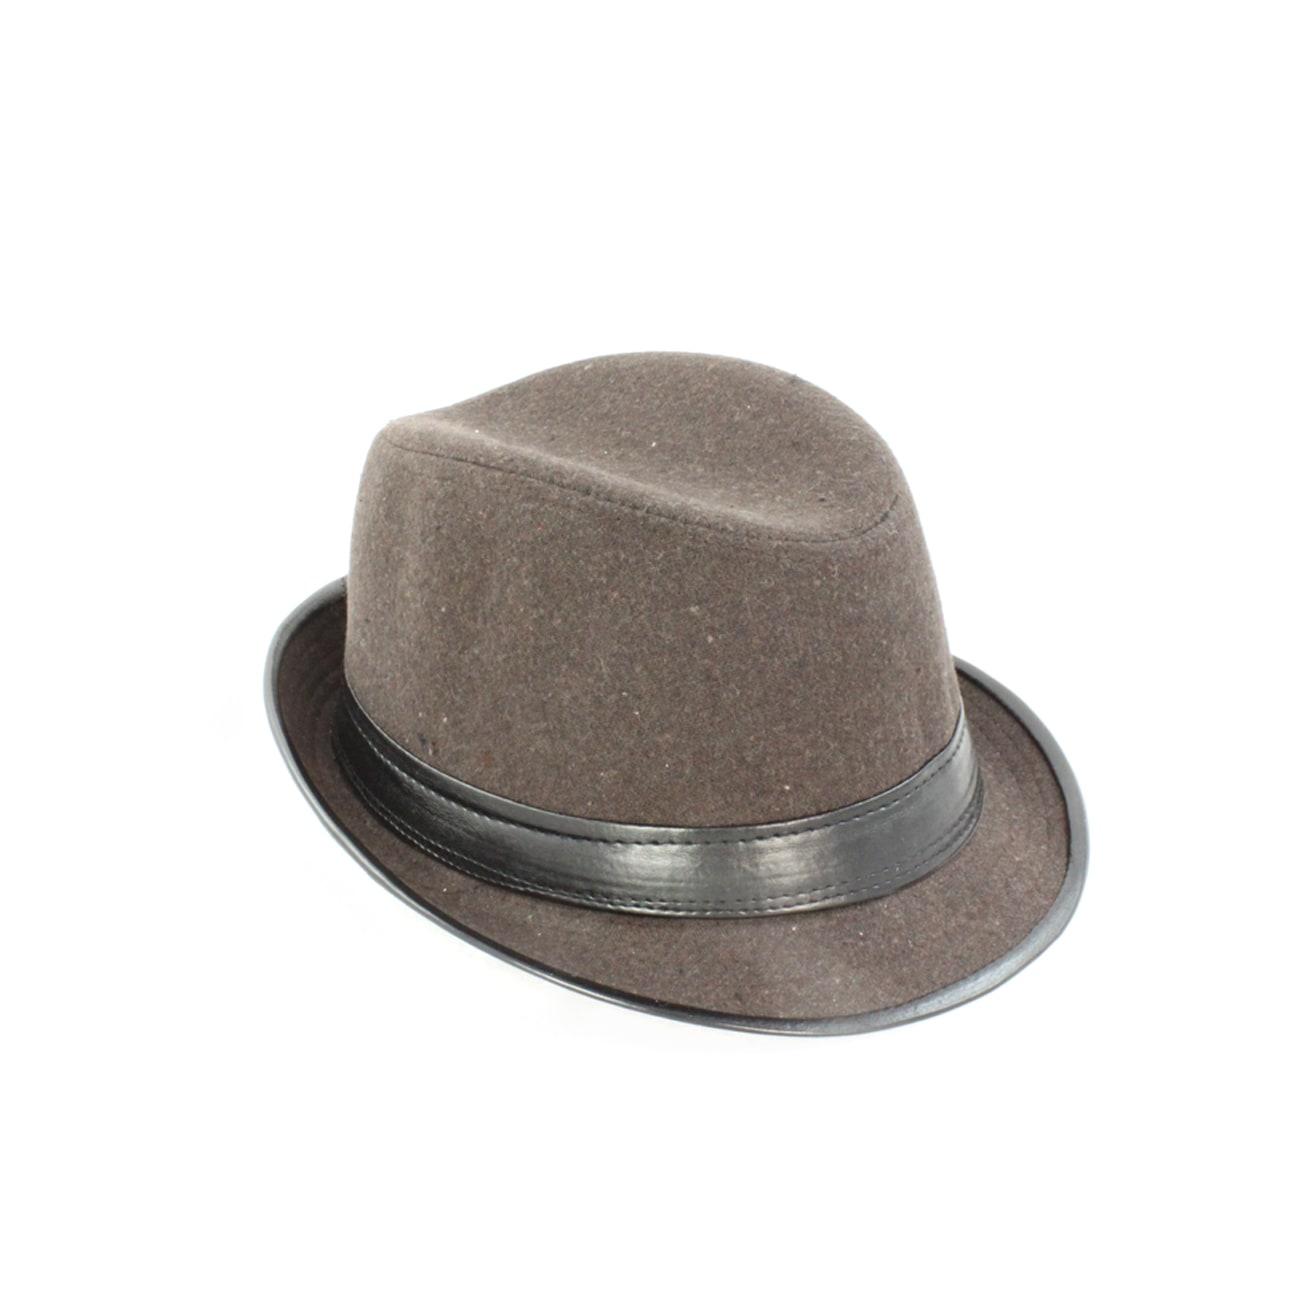 Faddism Men's 'Gentleman Brown' Wool Felt Fedora Hat